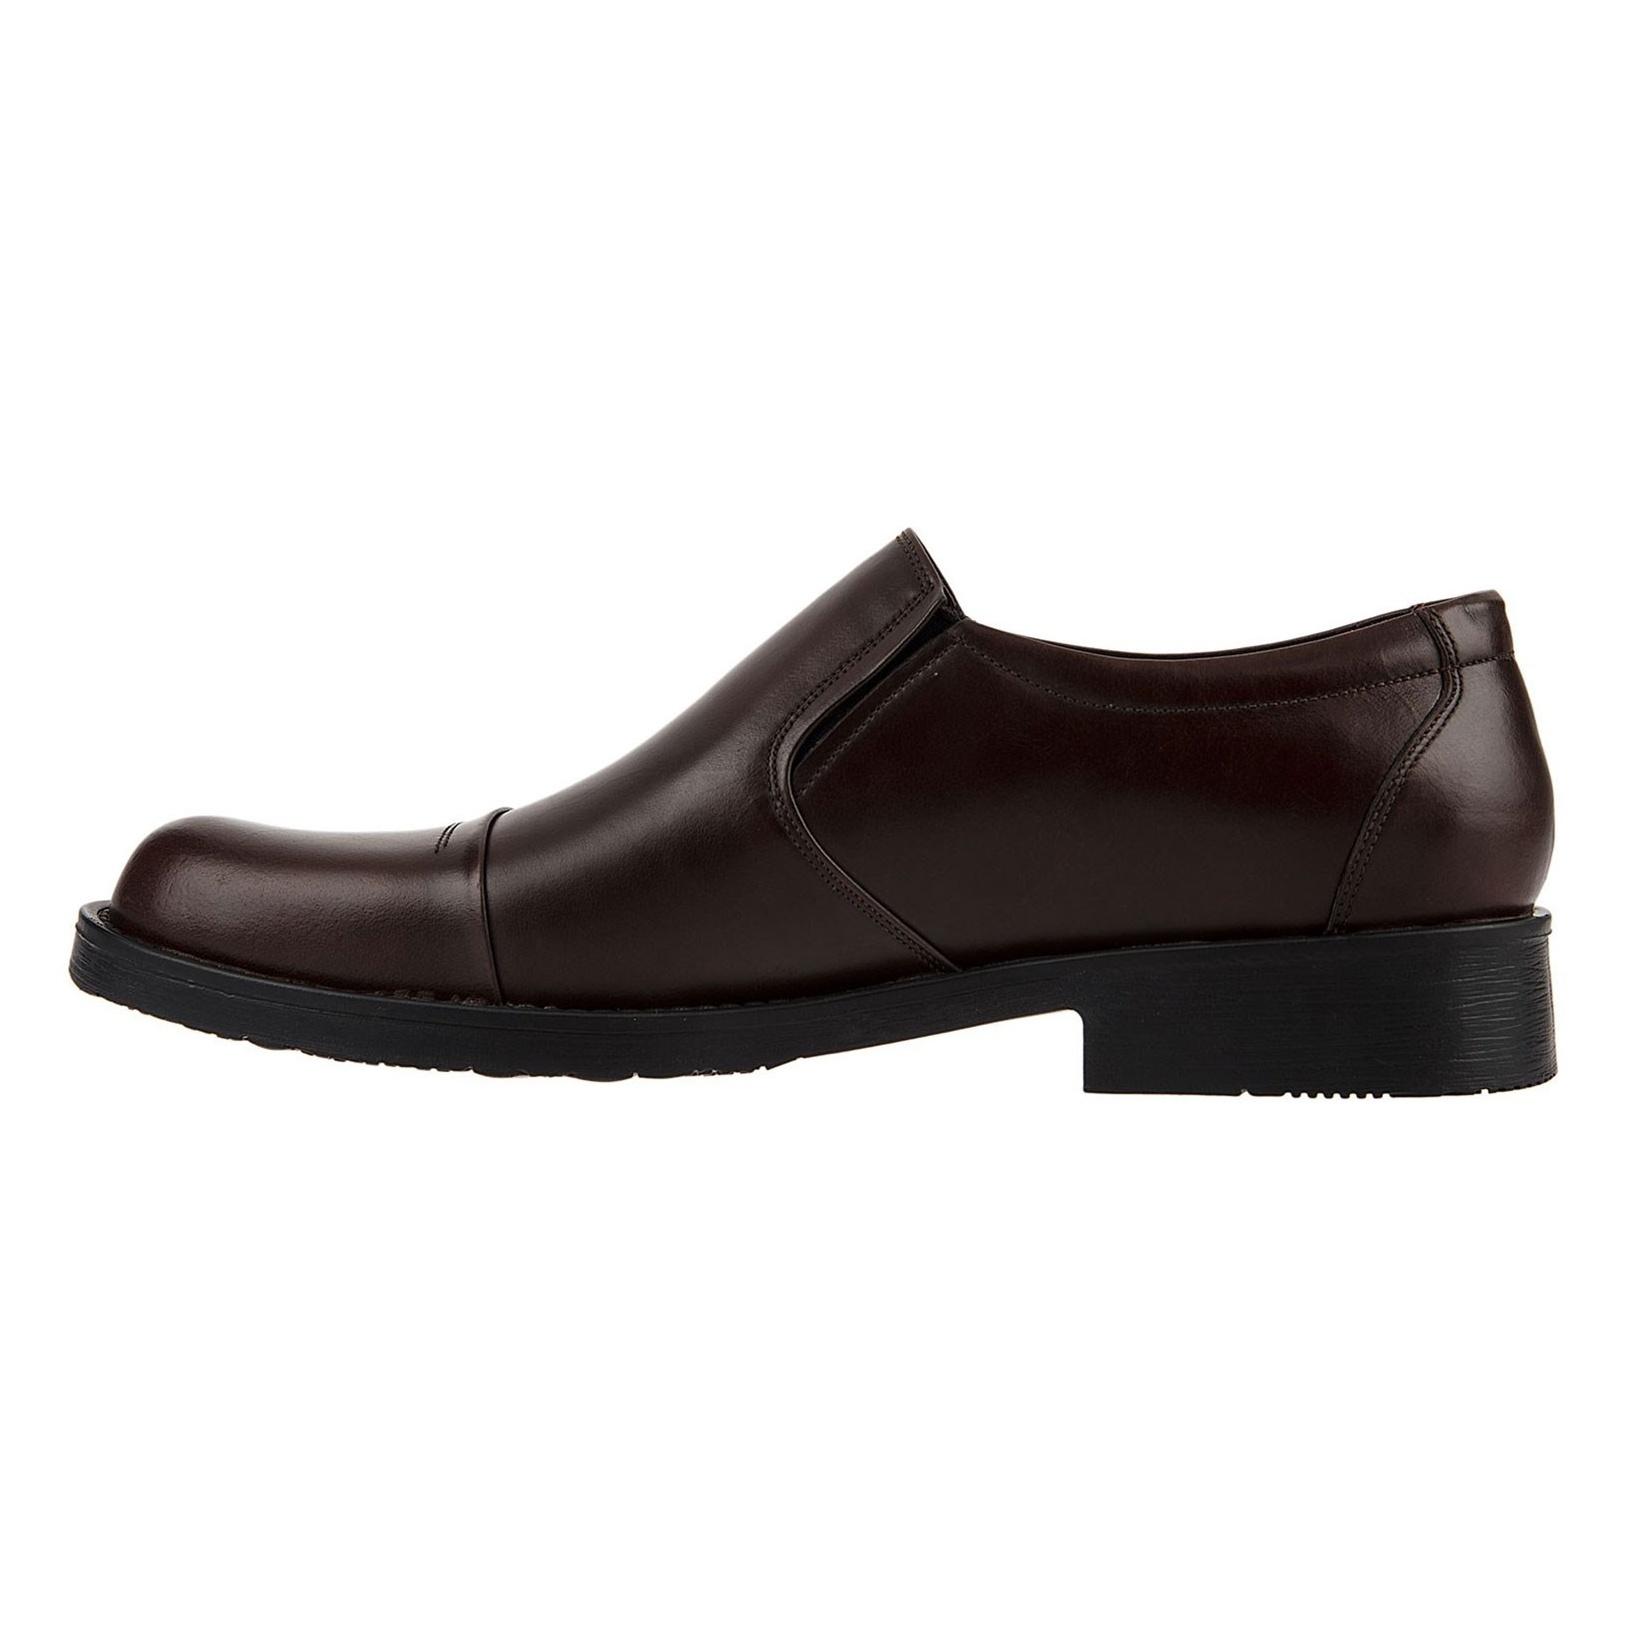 کفش اداری چرم مردانه - پانیسا - قهوه اي  - 3